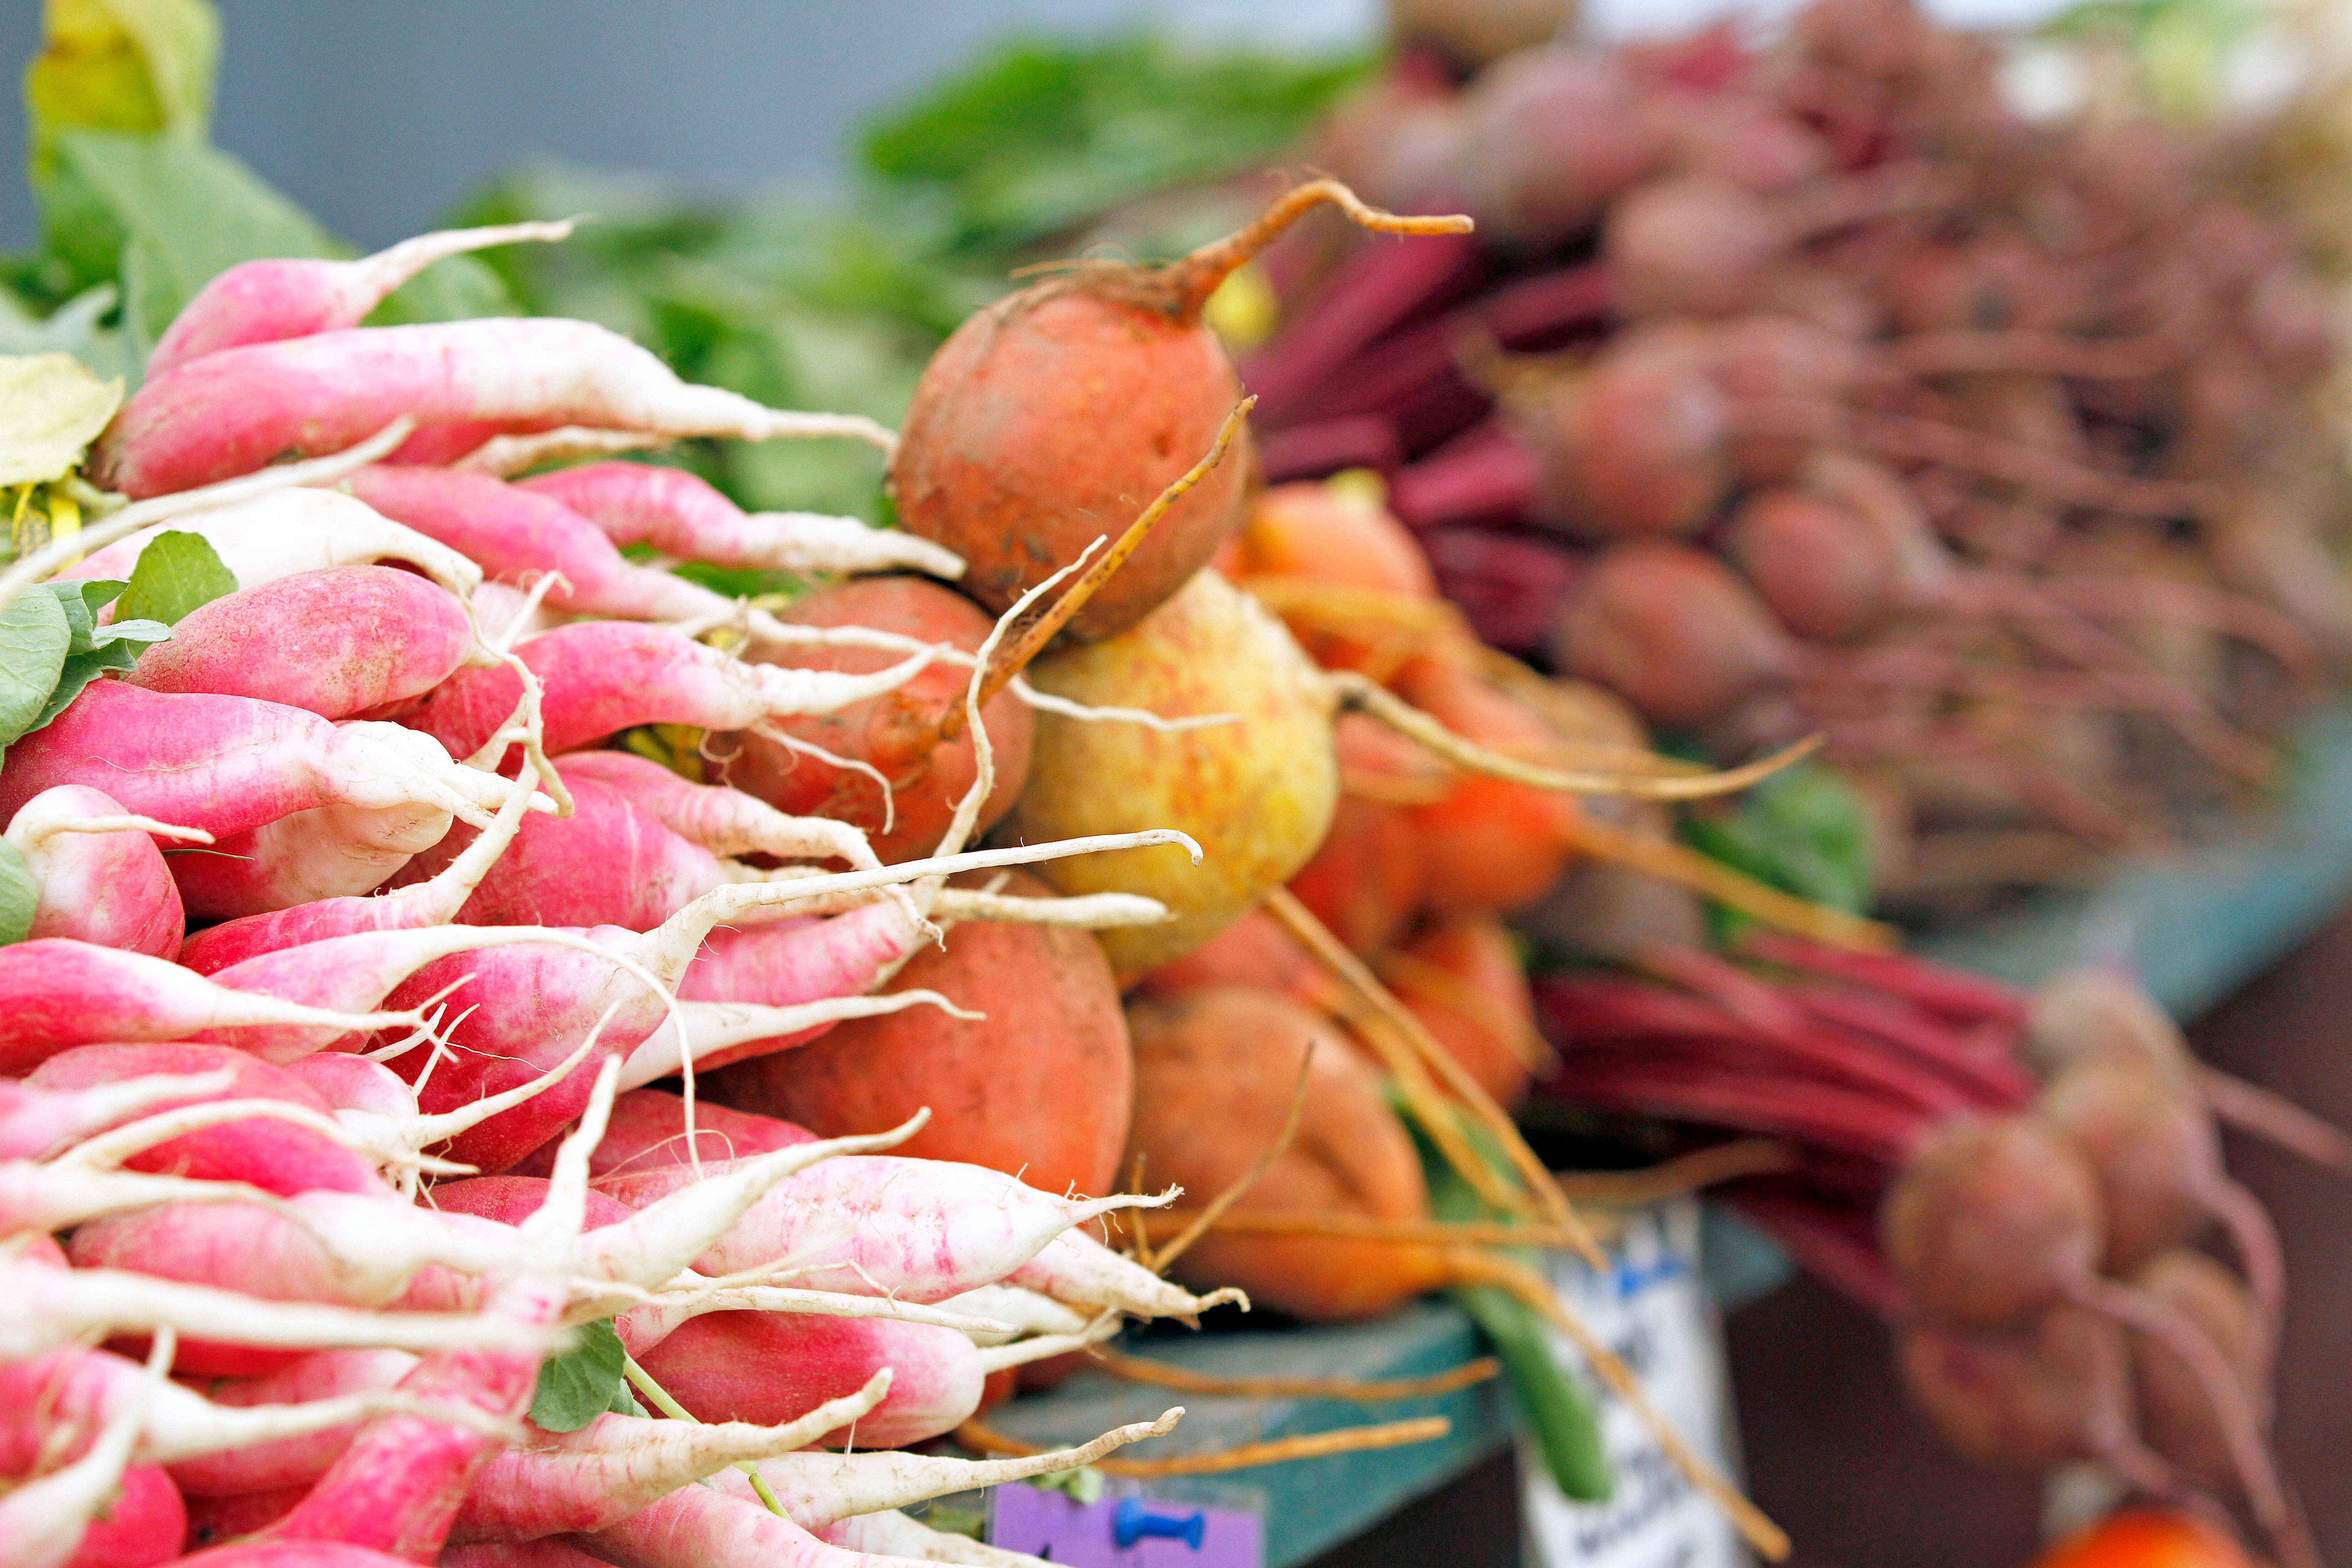 Fresh produce at the Lenox Farmers Market.